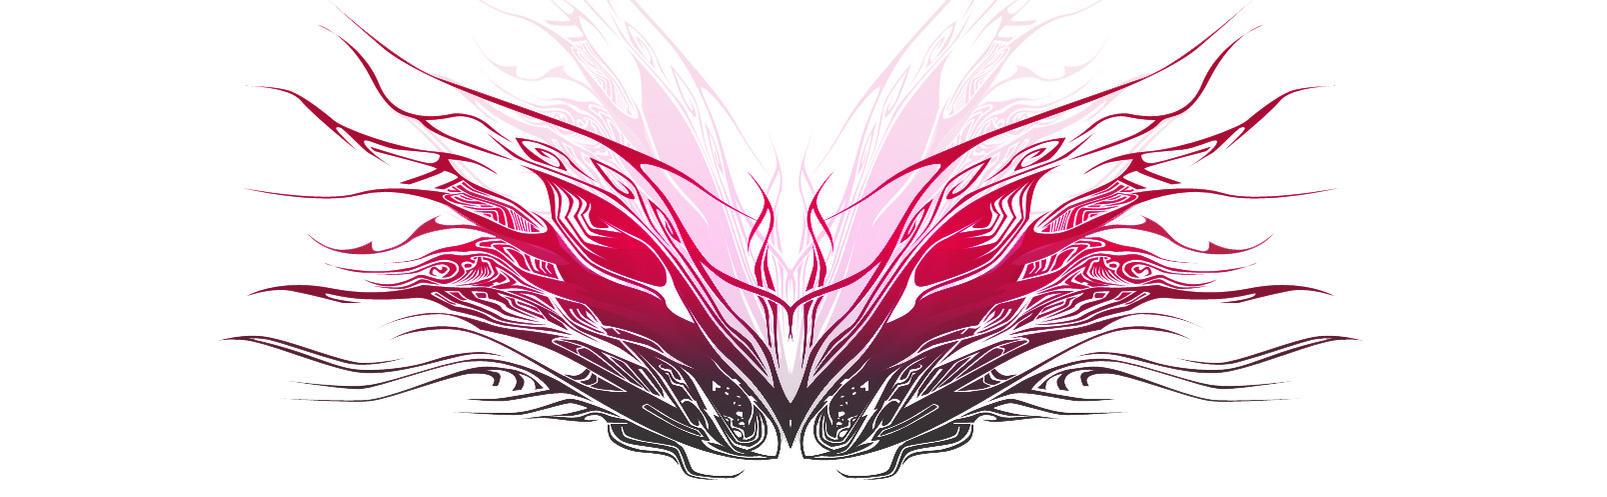 Graphic Design by phoenixq